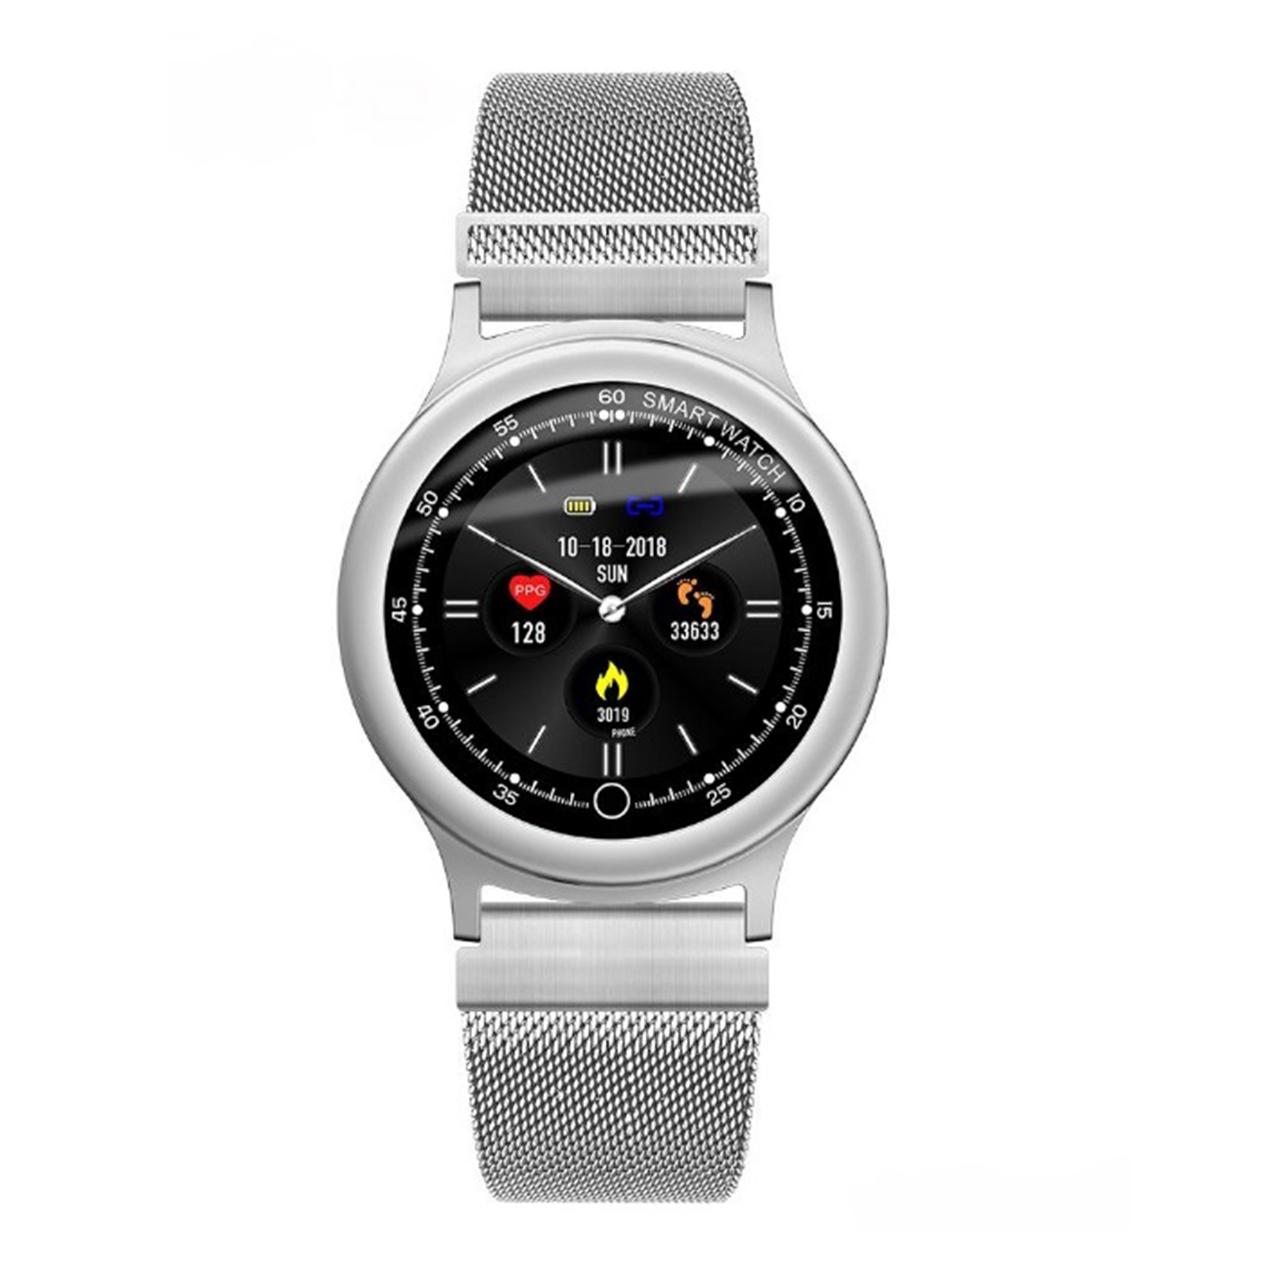 ساعت هوشمند مدل q28